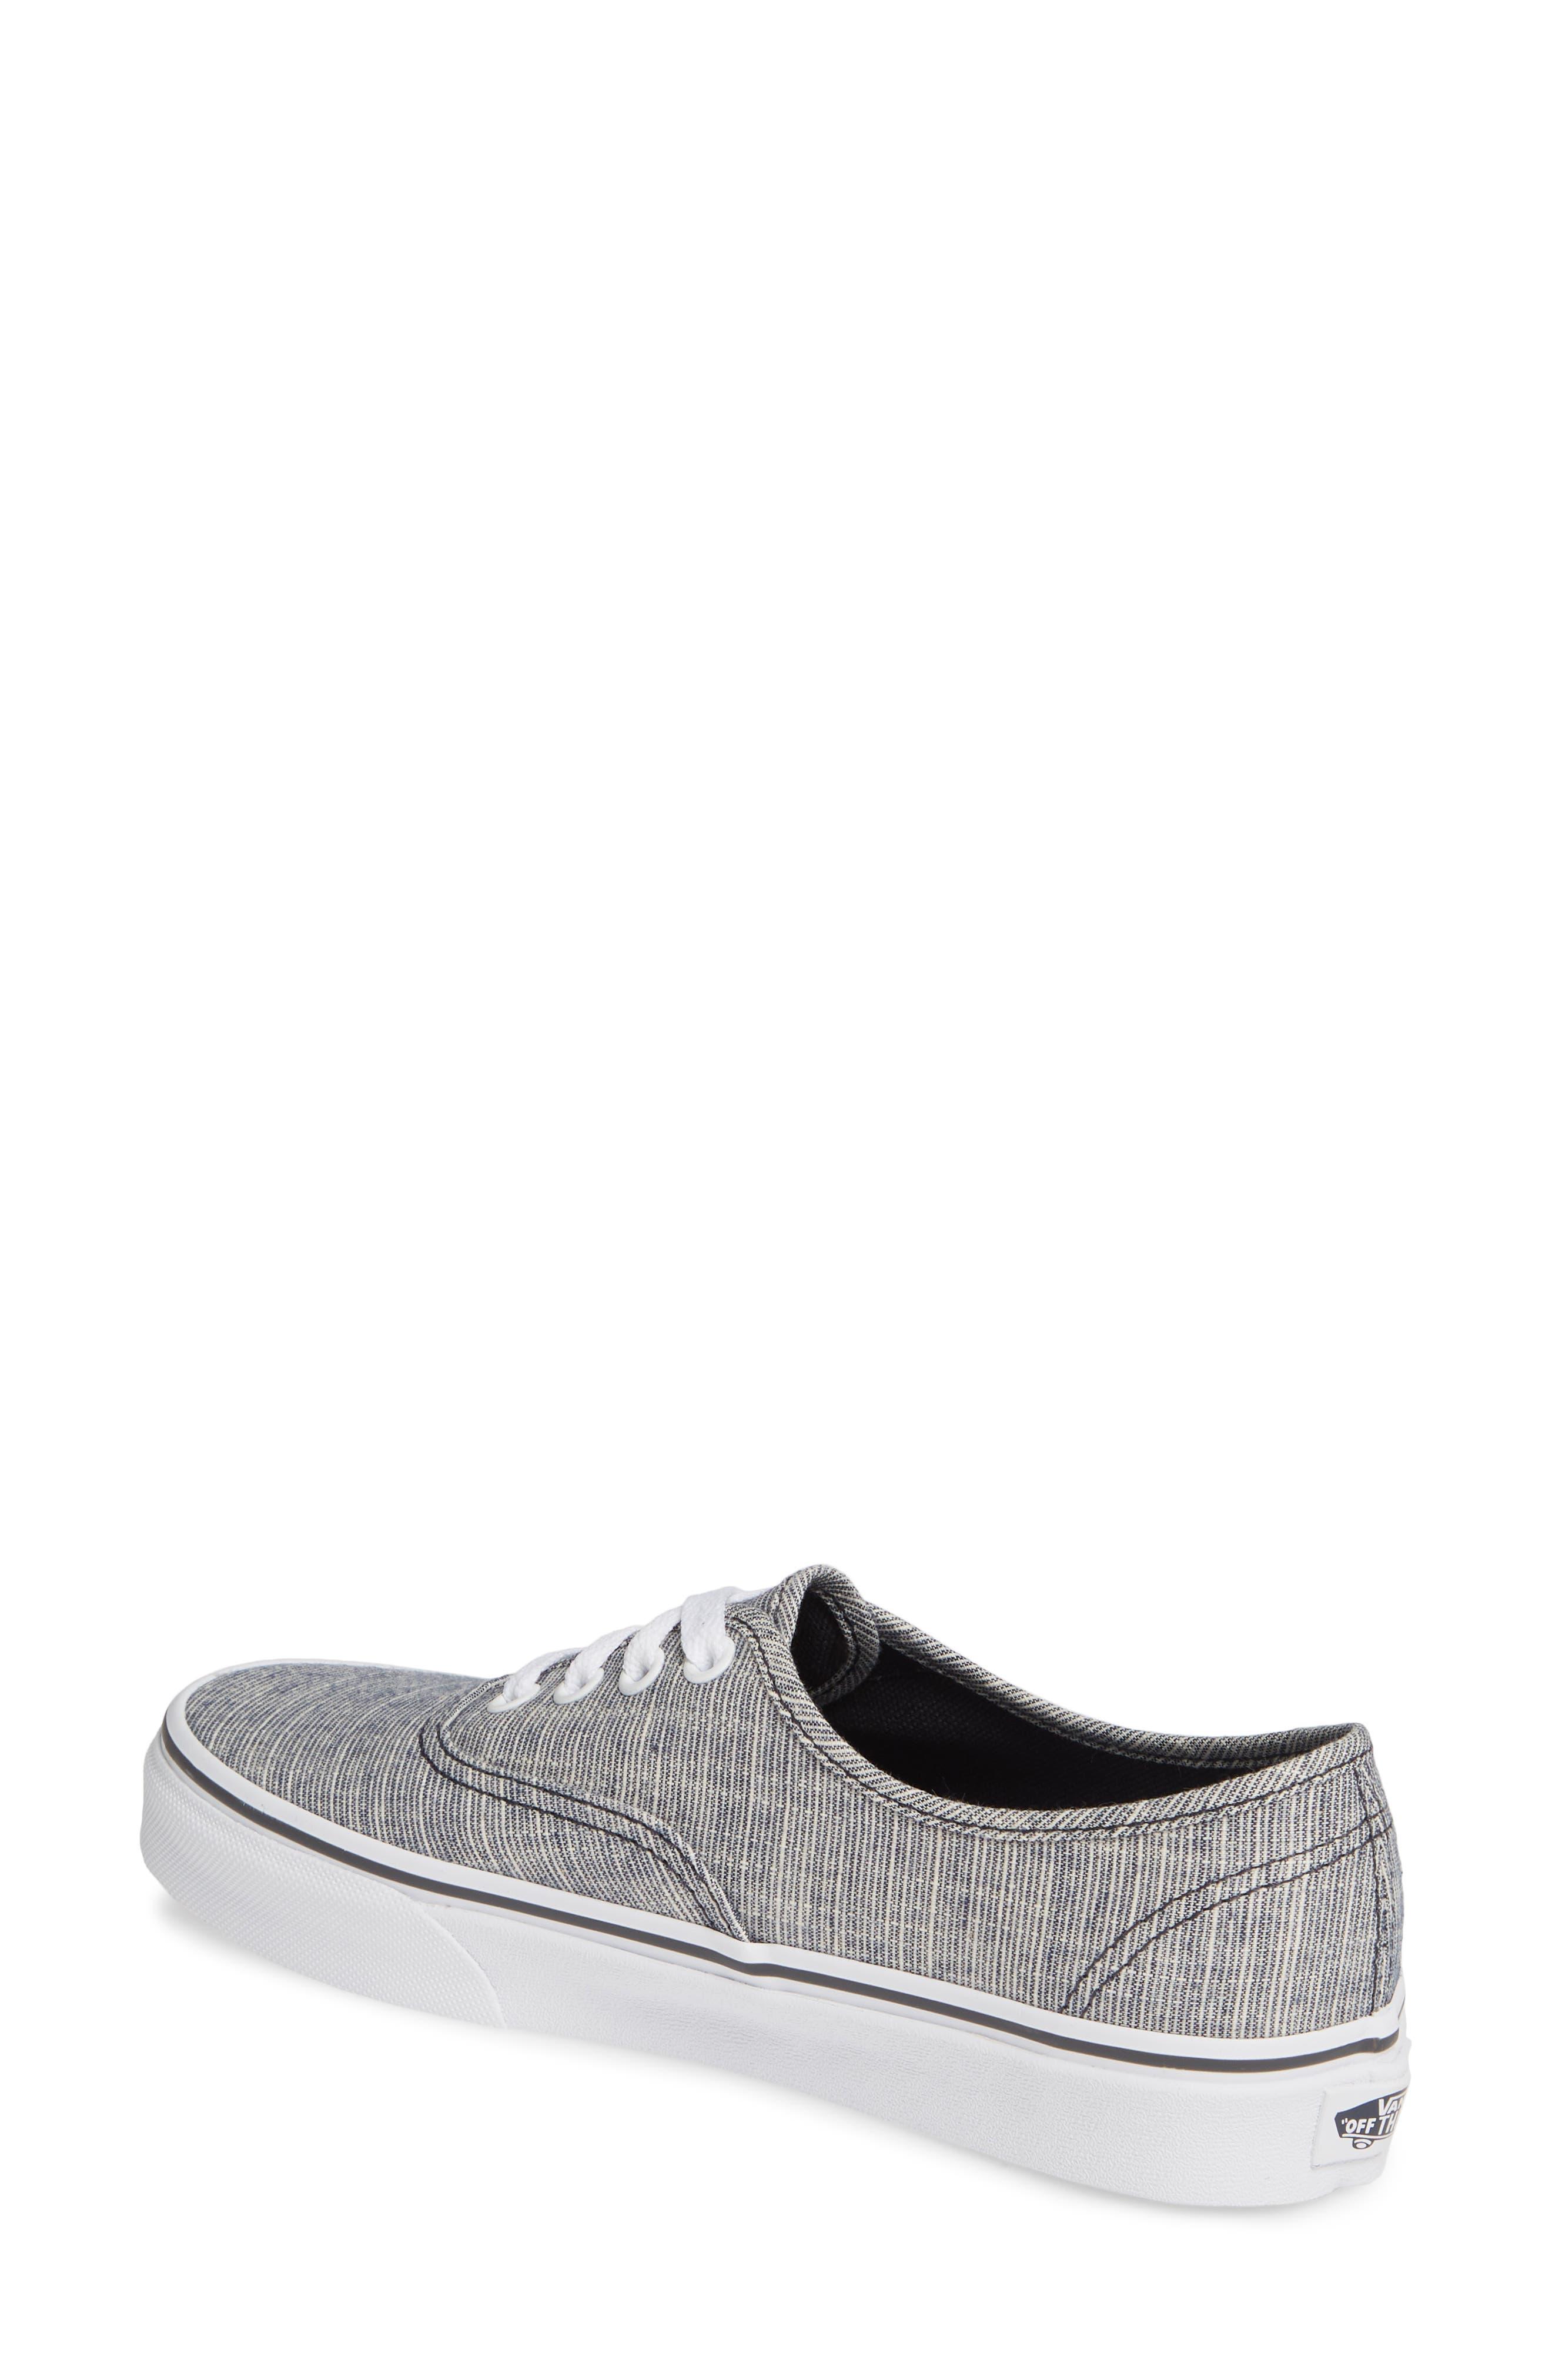 ,                             'Authentic' Sneaker,                             Alternate thumbnail 103, color,                             009